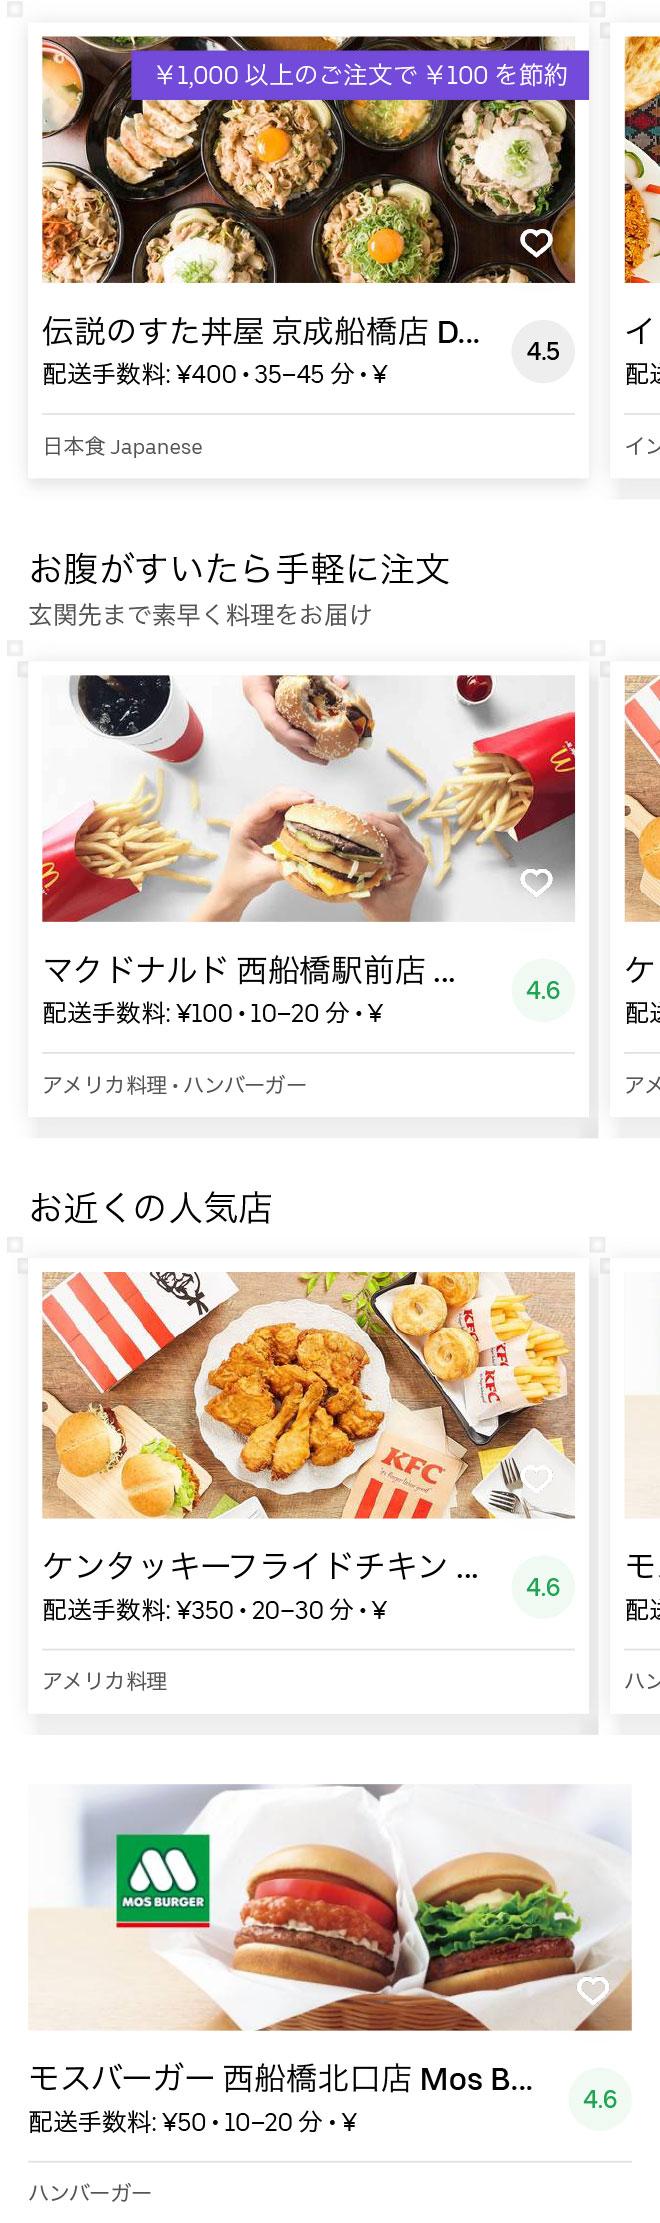 Funabashi nishi menu 2004 01